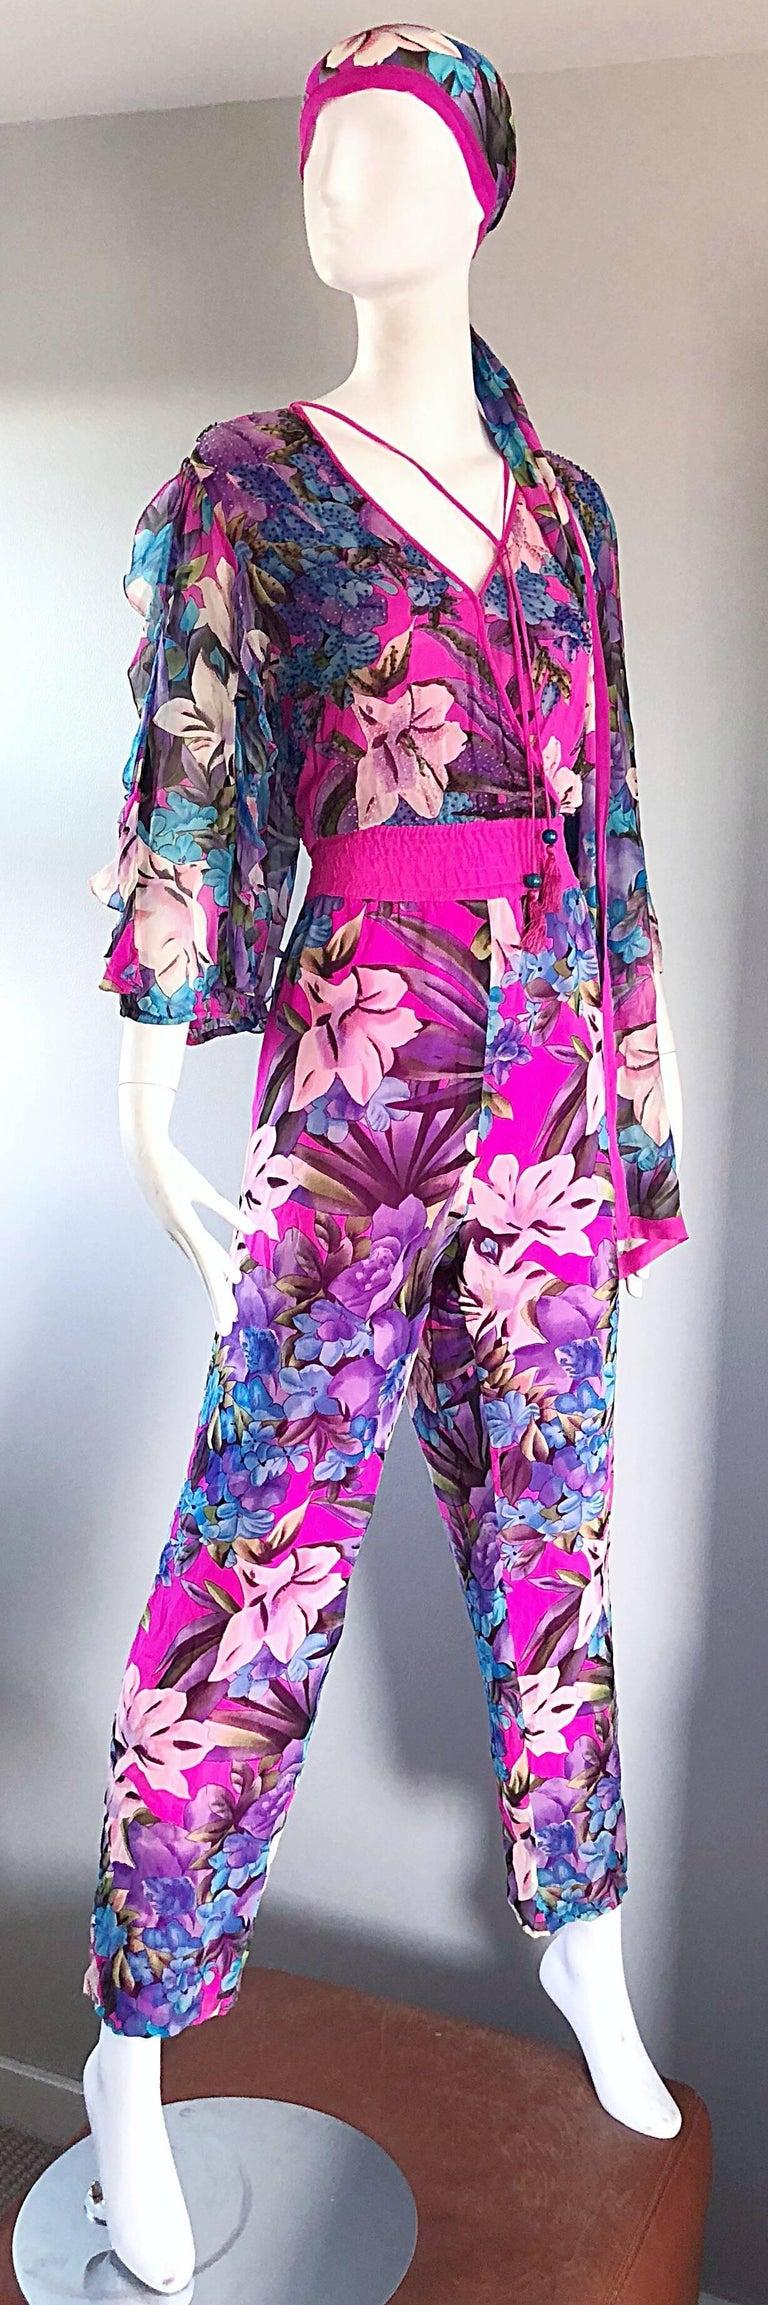 Amazing Vintage Diane Freis Silk Chiffon Beaded Pink Jumpsuit & Head Scarf Sash  For Sale 1